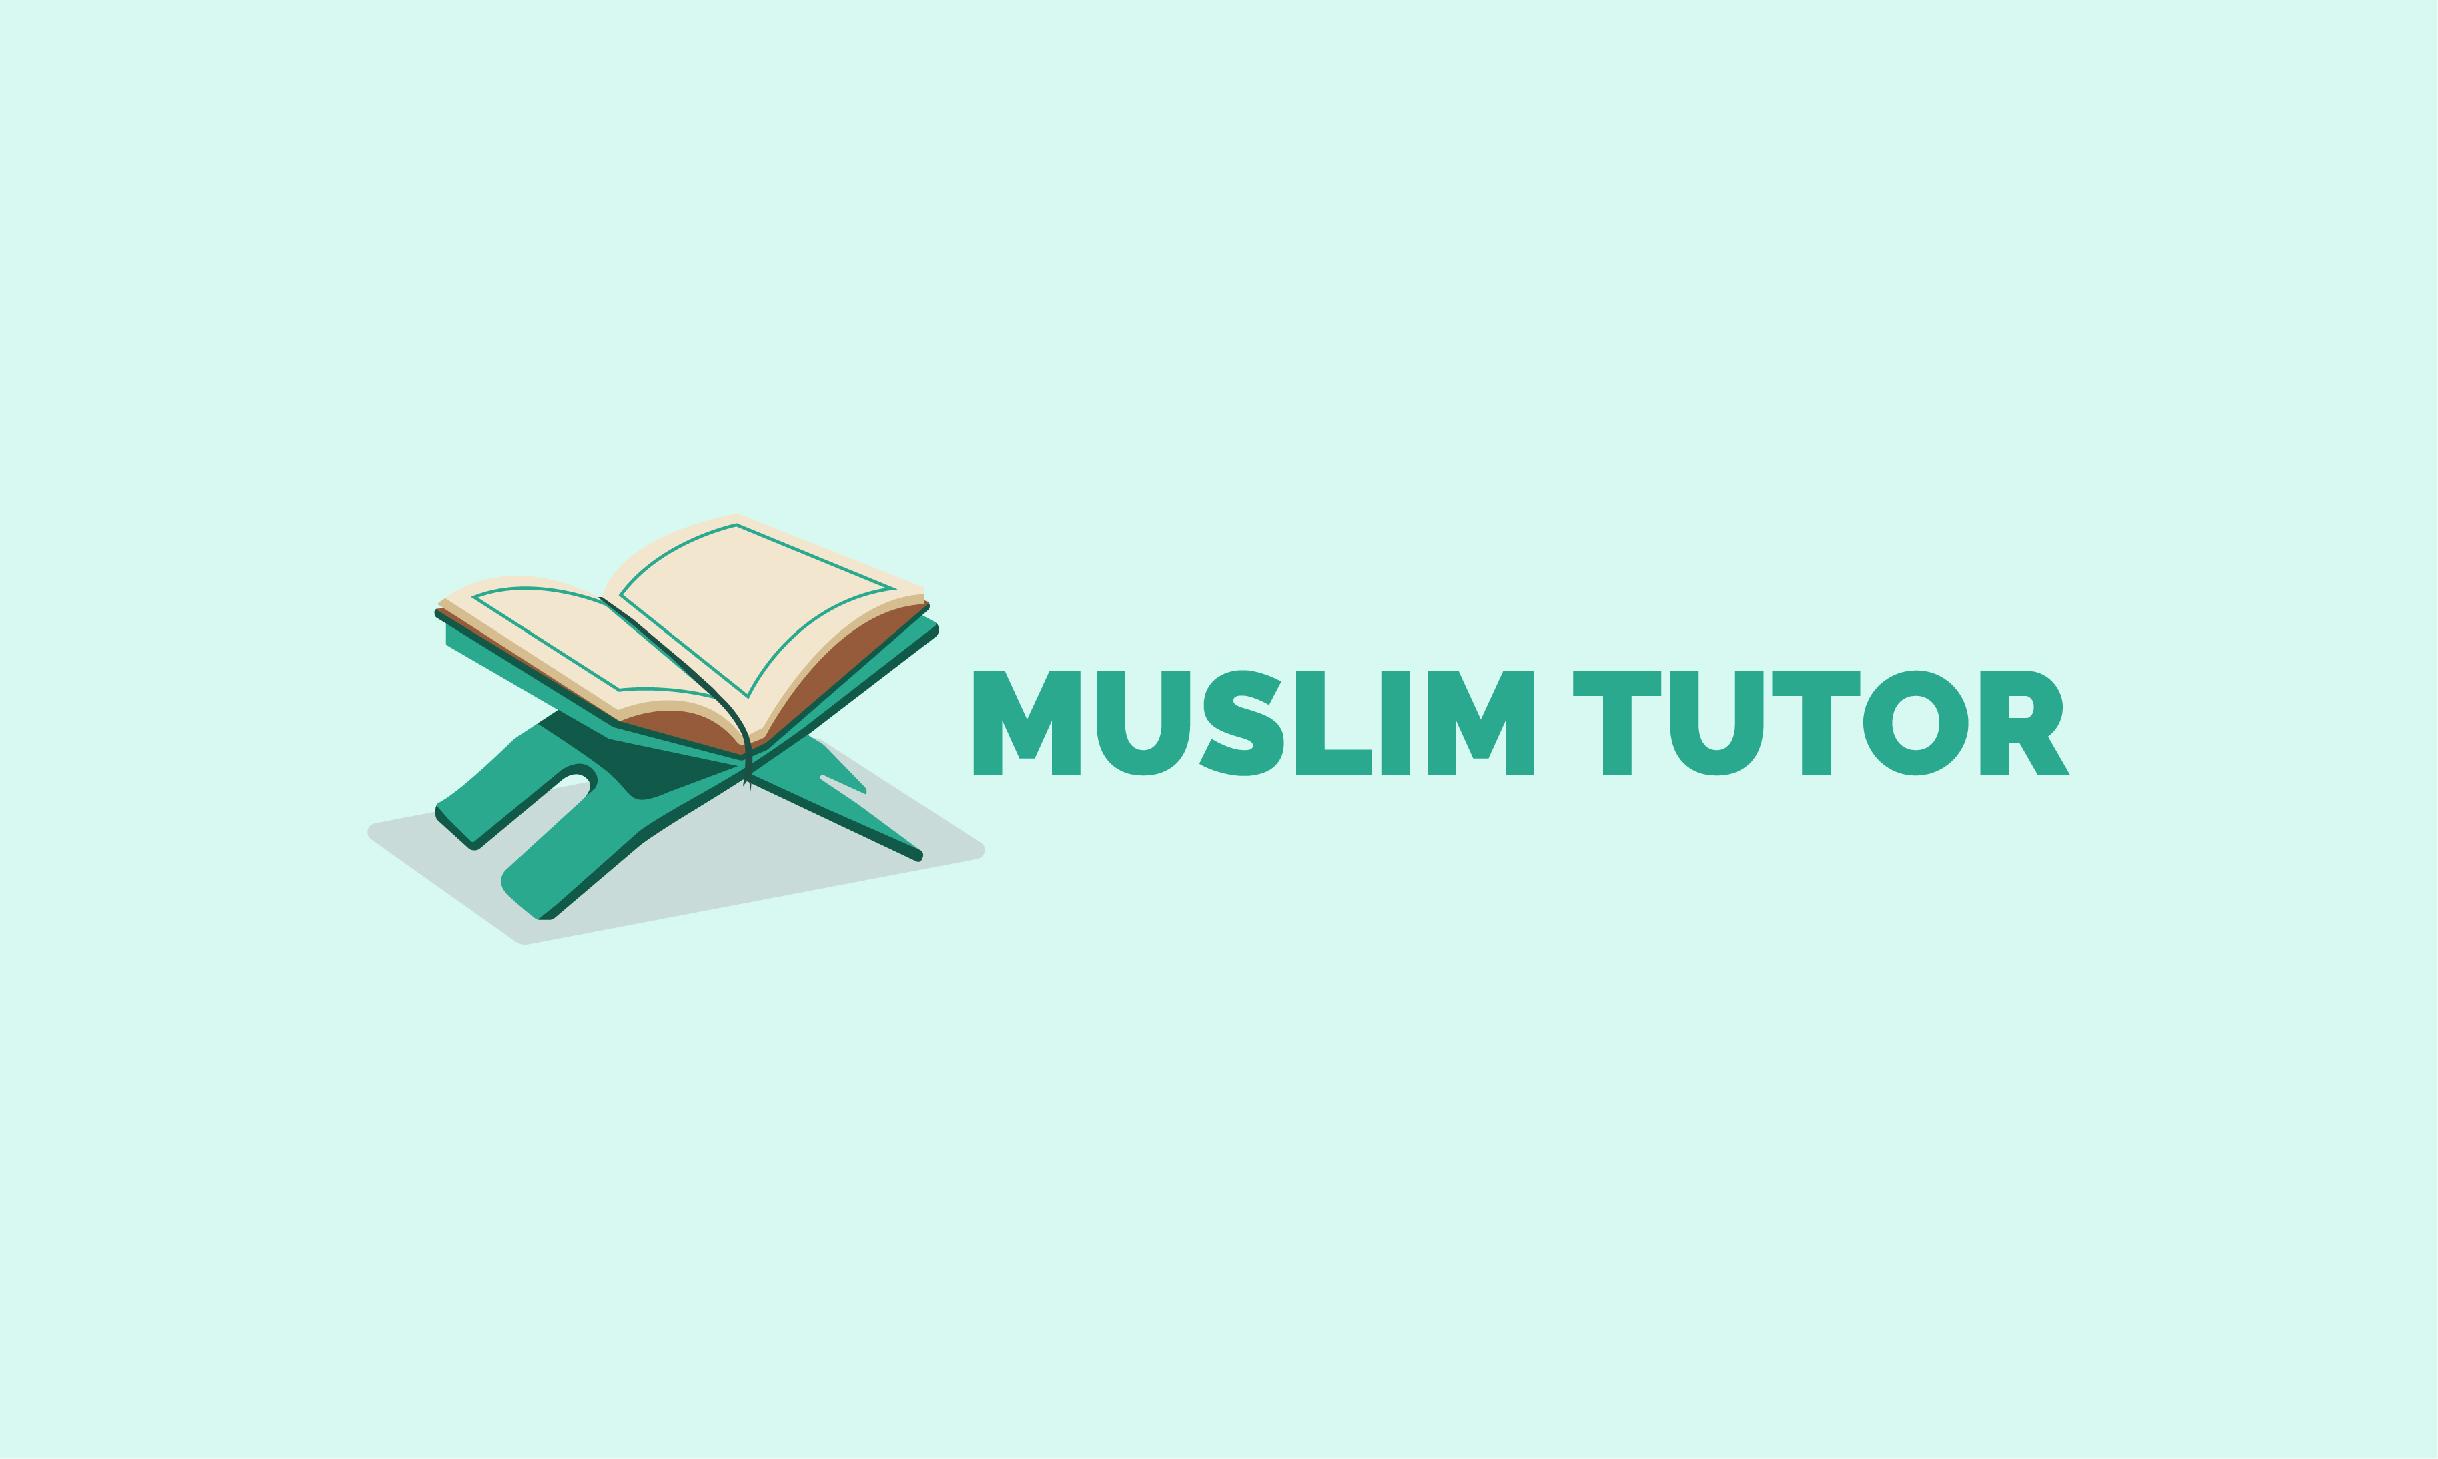 [object object] E Muslim Tutor Portfolio feature image E Muslim Tutor